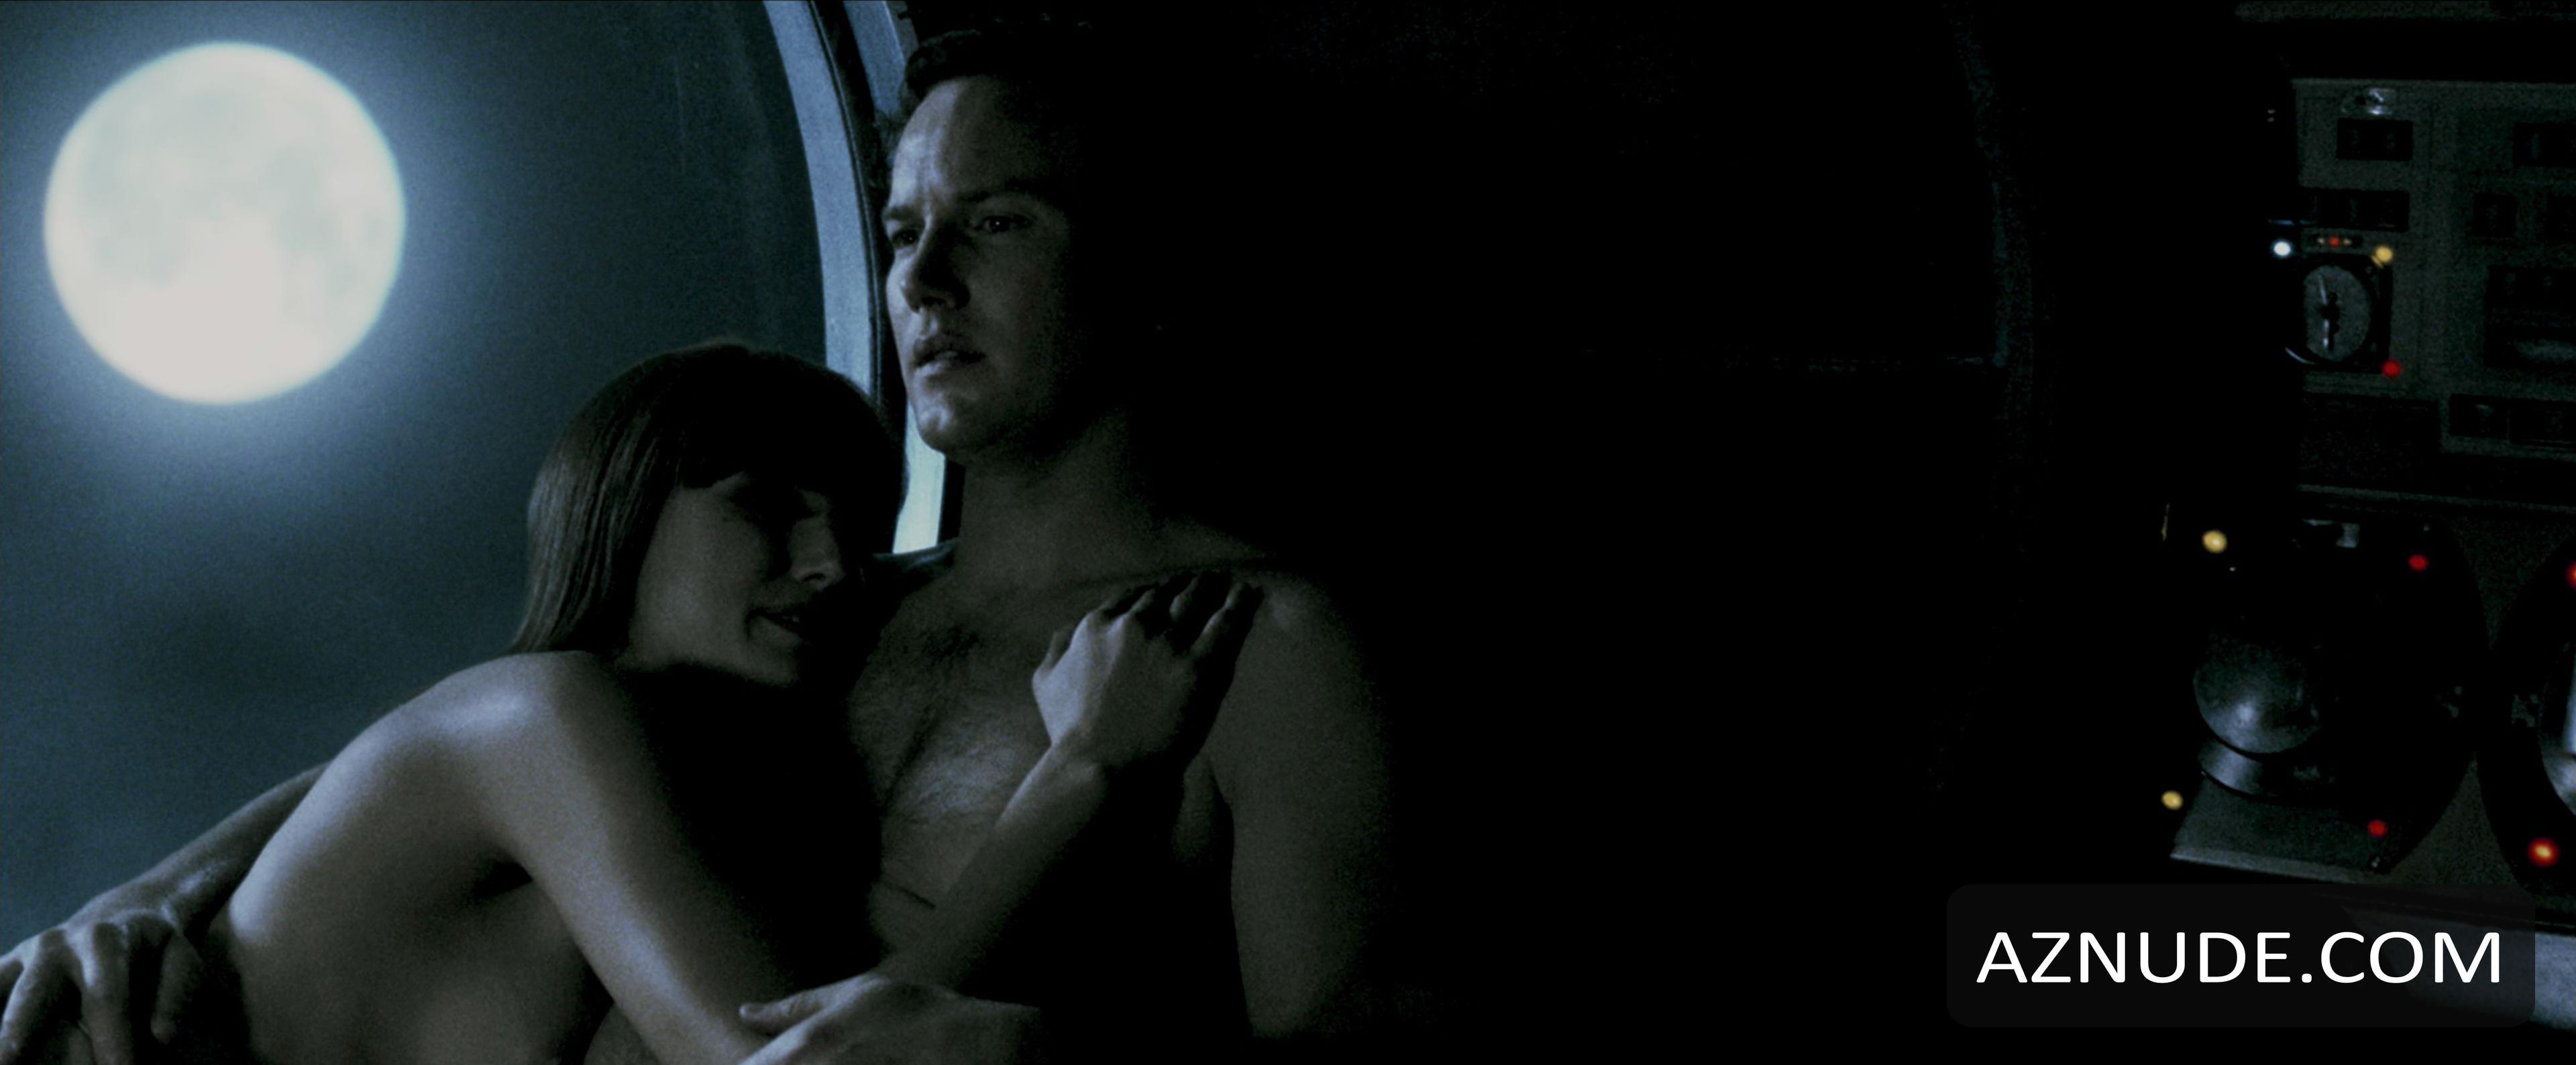 Hot Watchmen naked pics